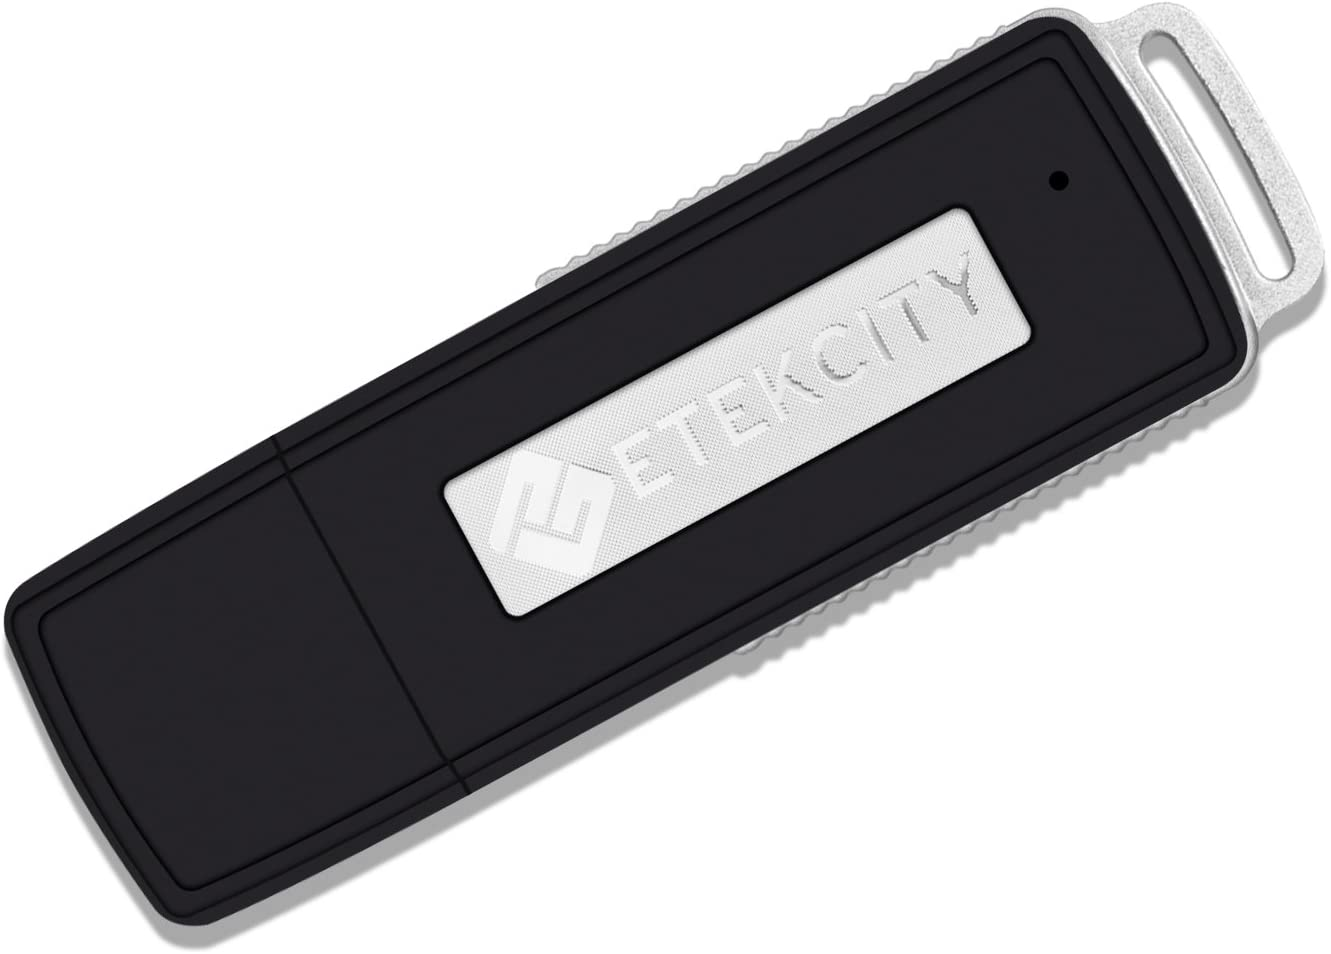 Etekcity® VR-08 Mini Grabadora de Voz Digital, USB 8GB, Grabadora ...